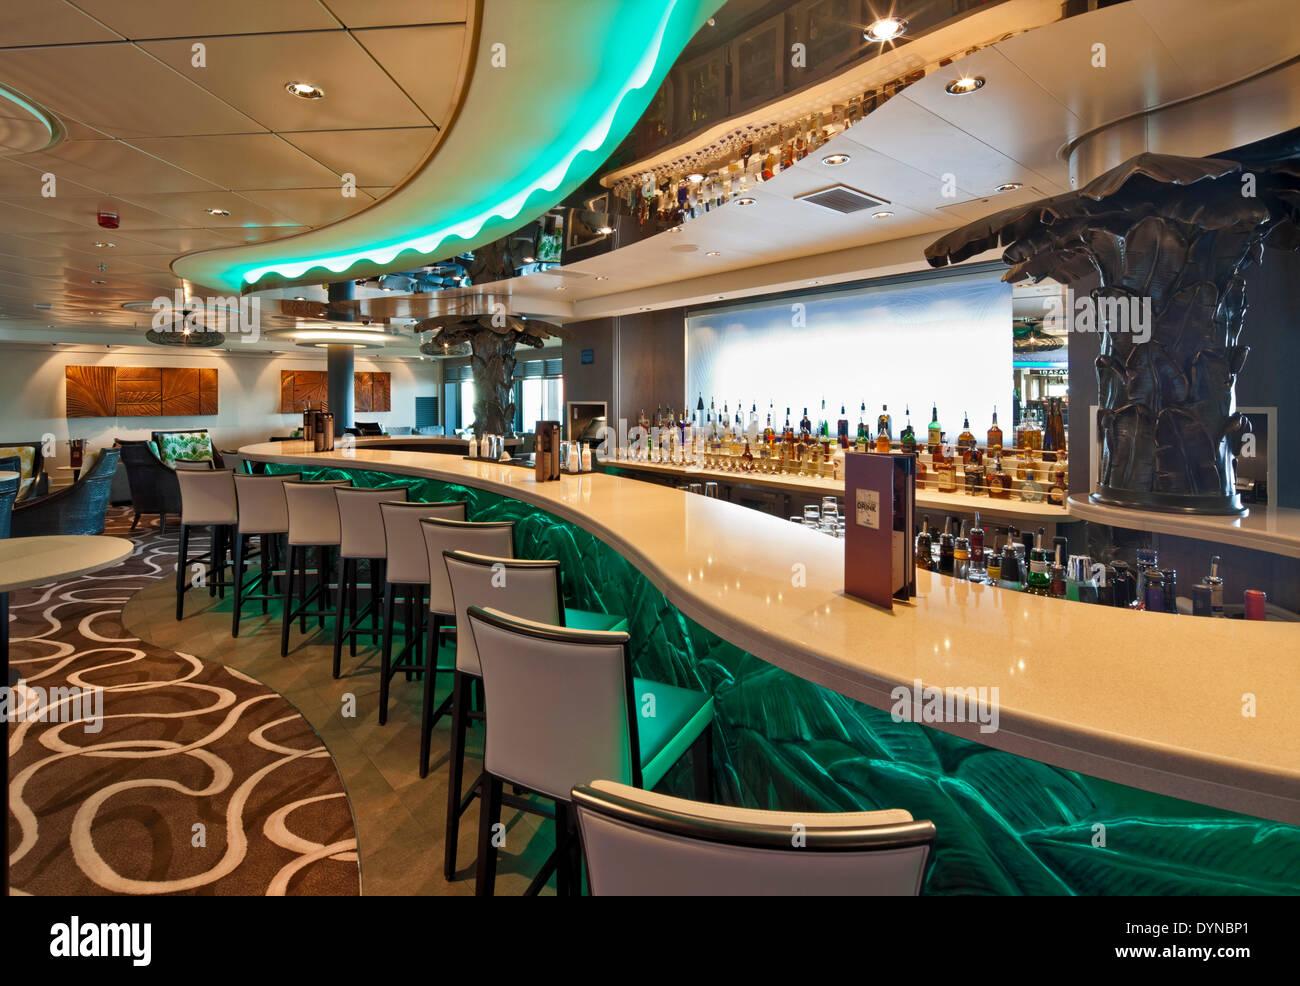 Norwegian Getaway Cruise Ship, Southampton, United Kingdom. Architect: SMC Design, 2014. - Stock Image